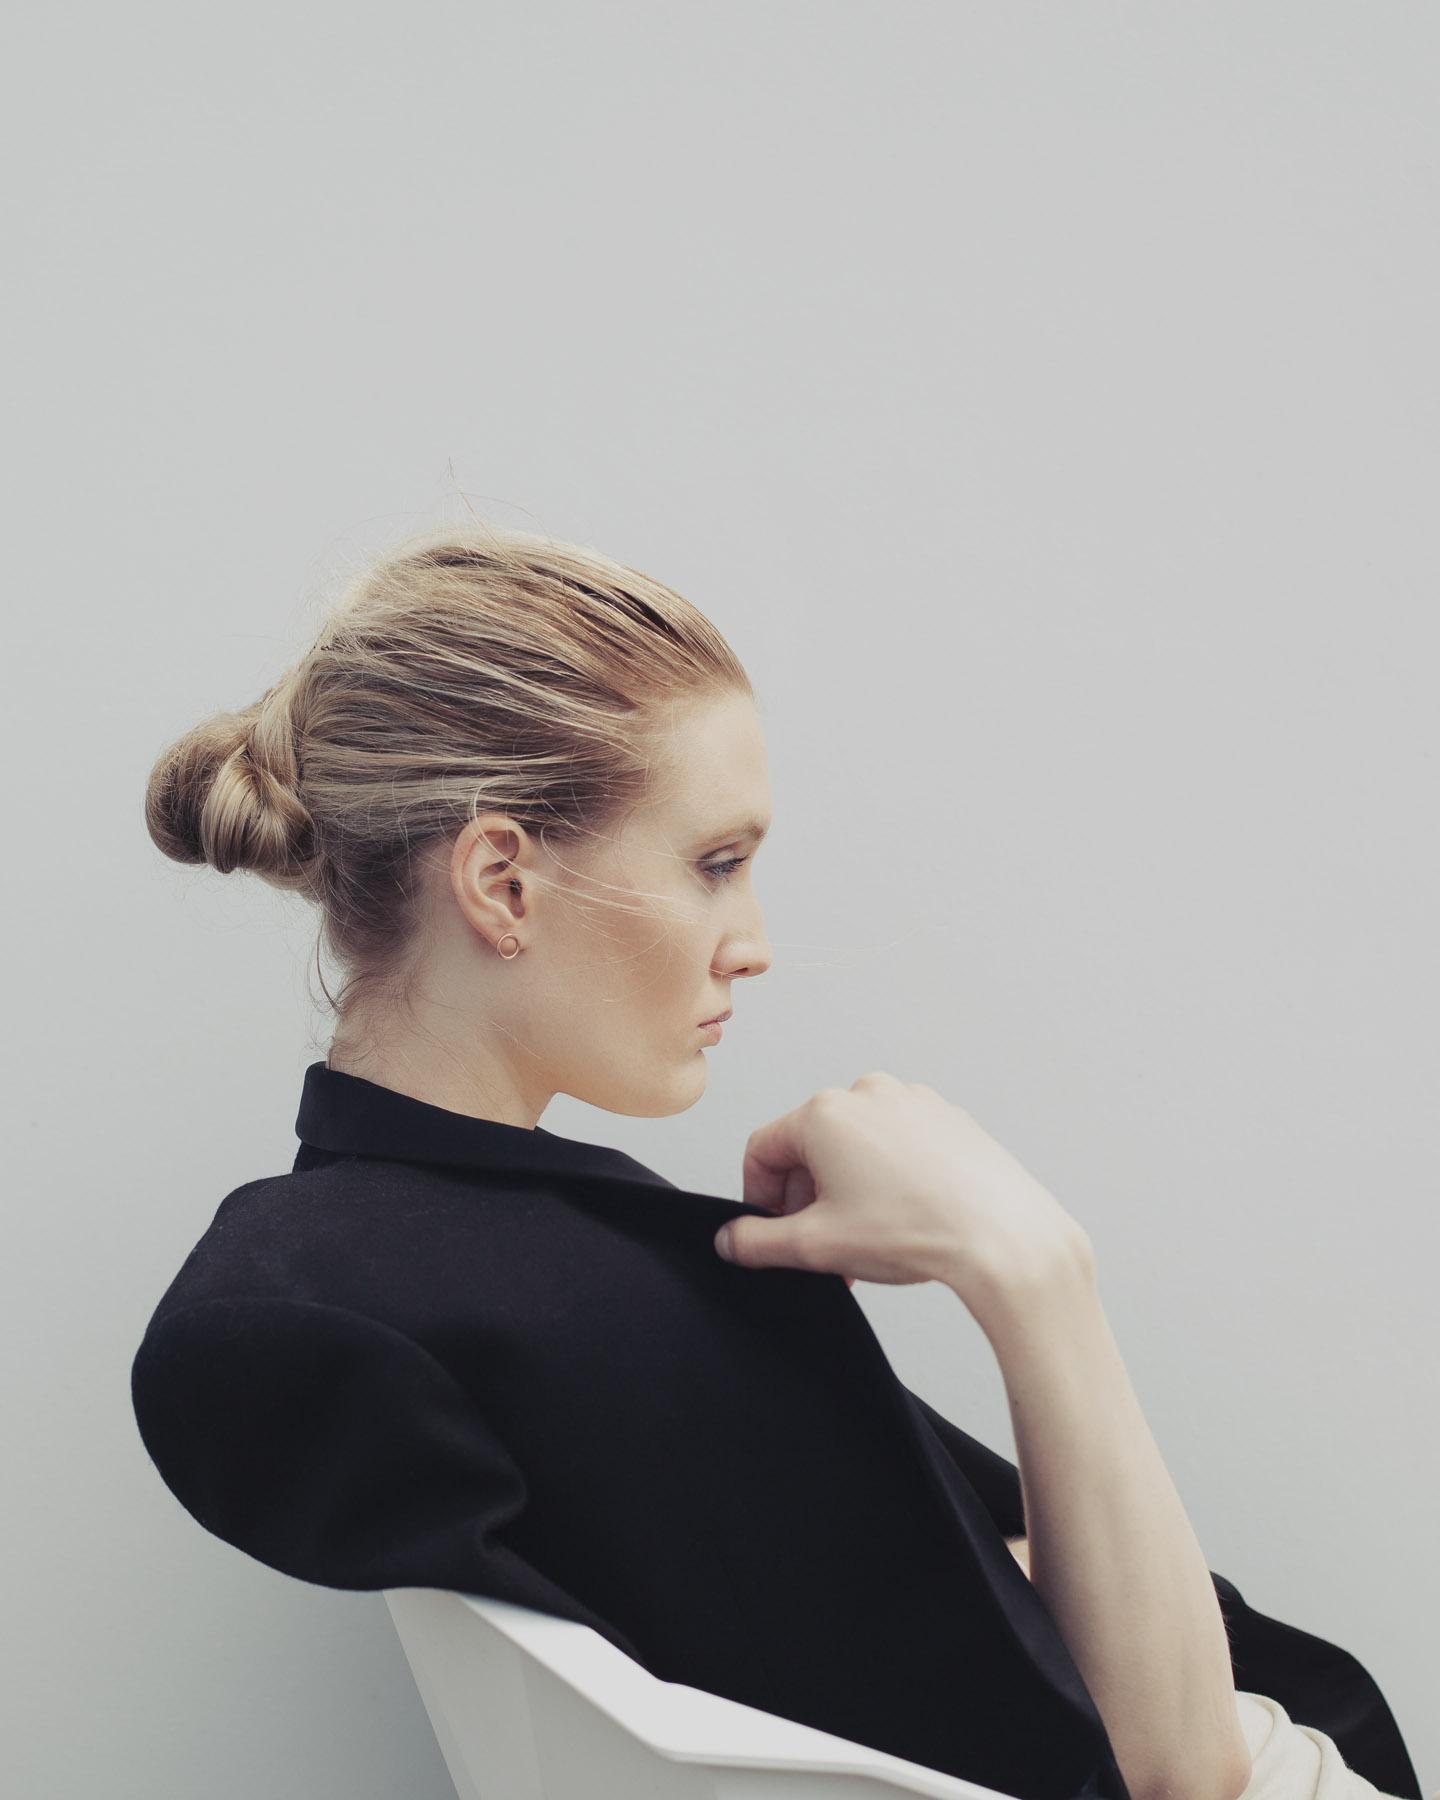 Hannah Larson - The Healthful Model